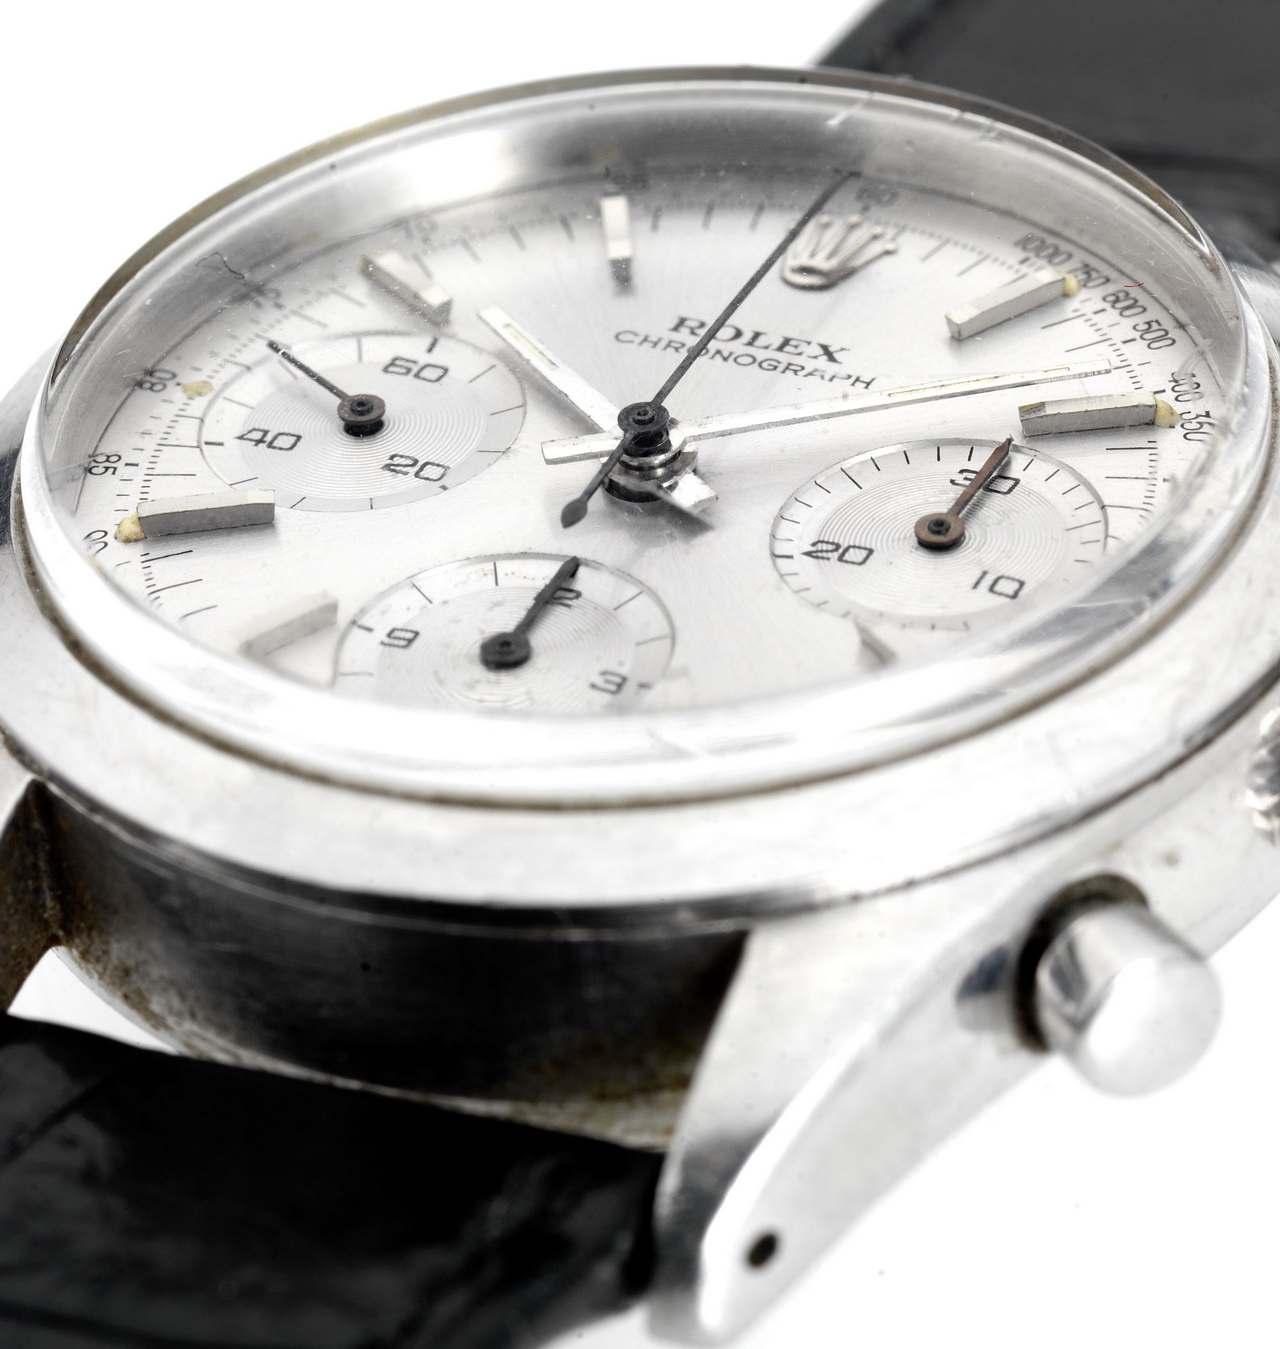 Rolex_Pre_daytona_Ref_6238_ Case No.1226269_prezzo_price_source_bonhams3